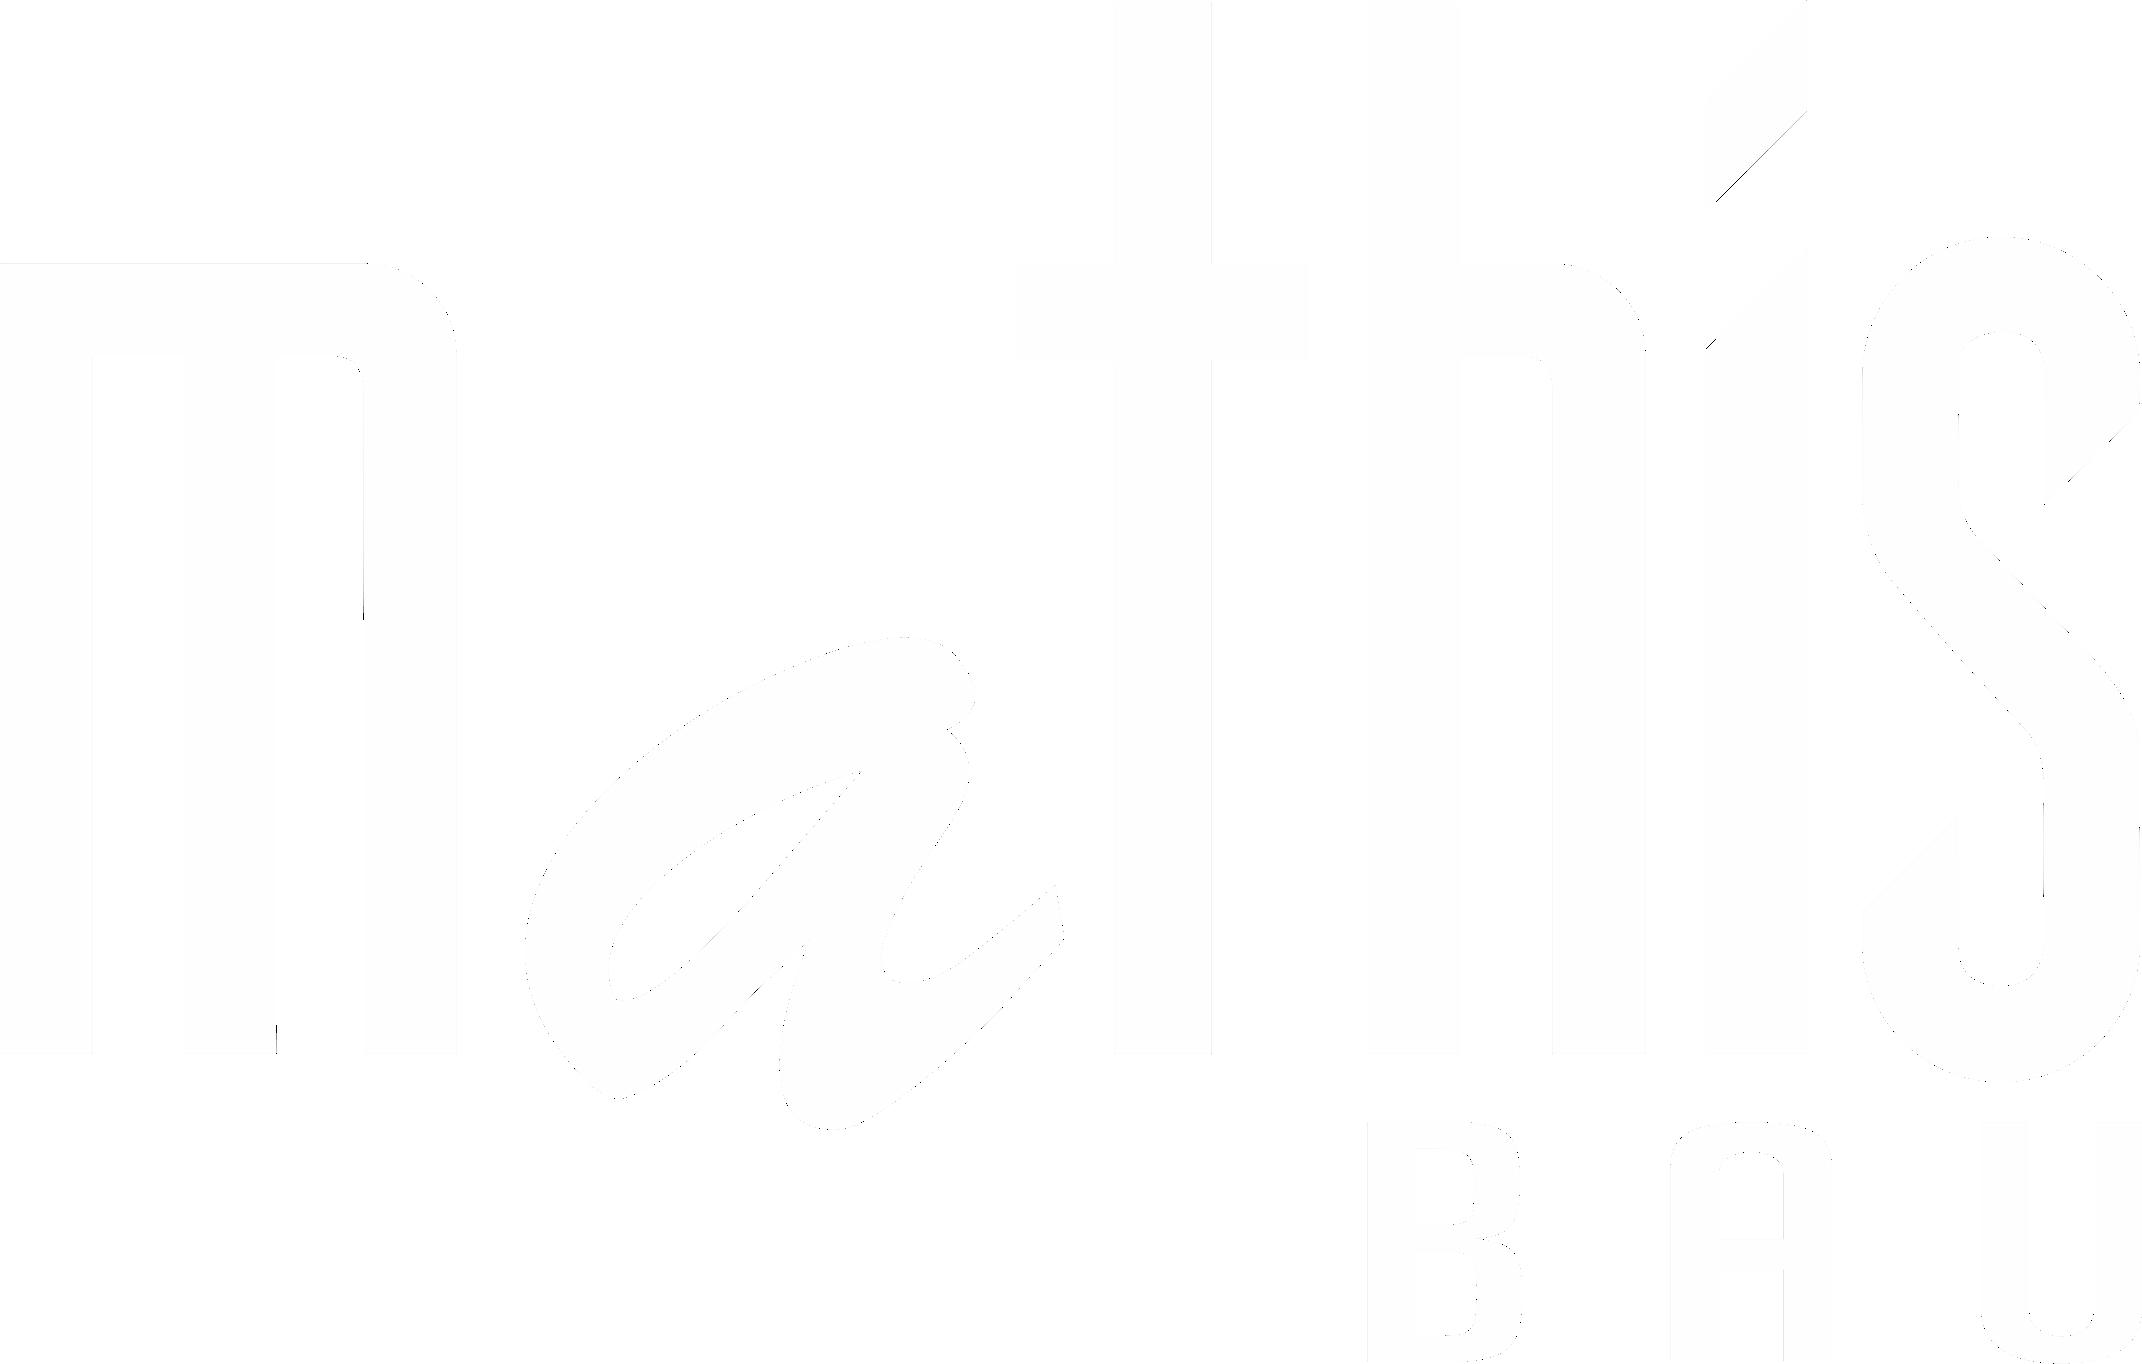 Mathis-Bau-weiß